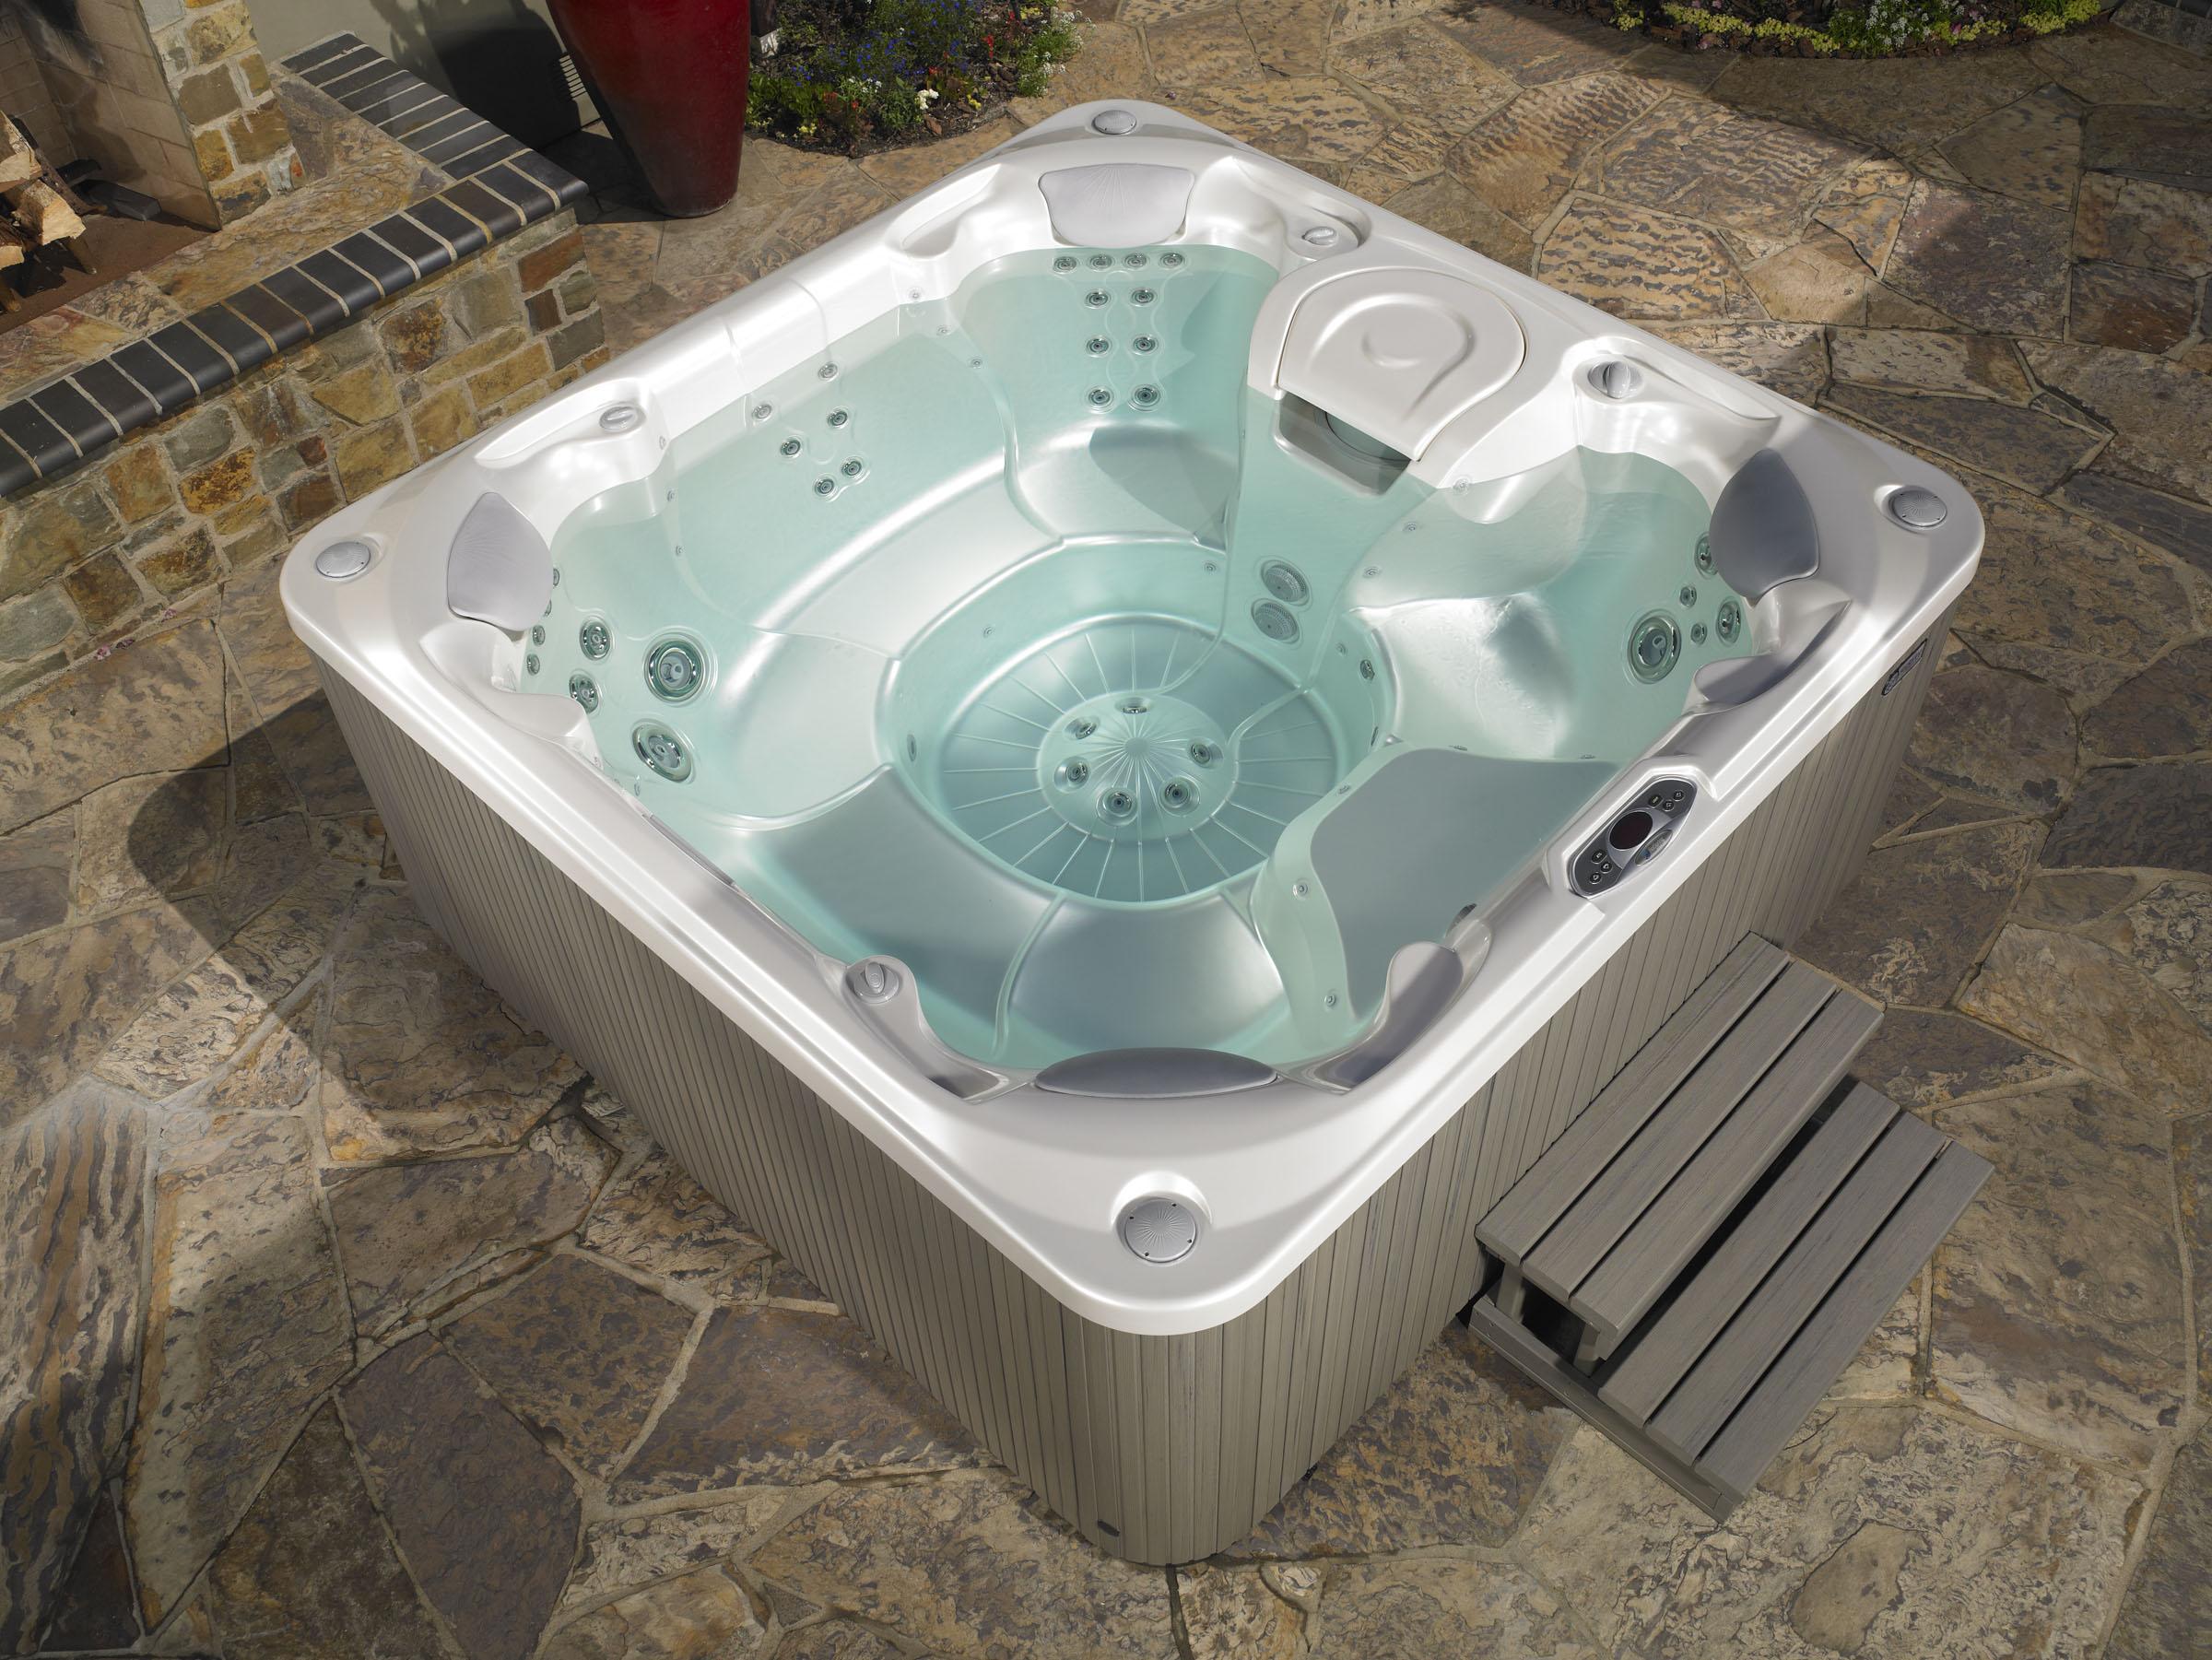 limelight flair hot tub manual